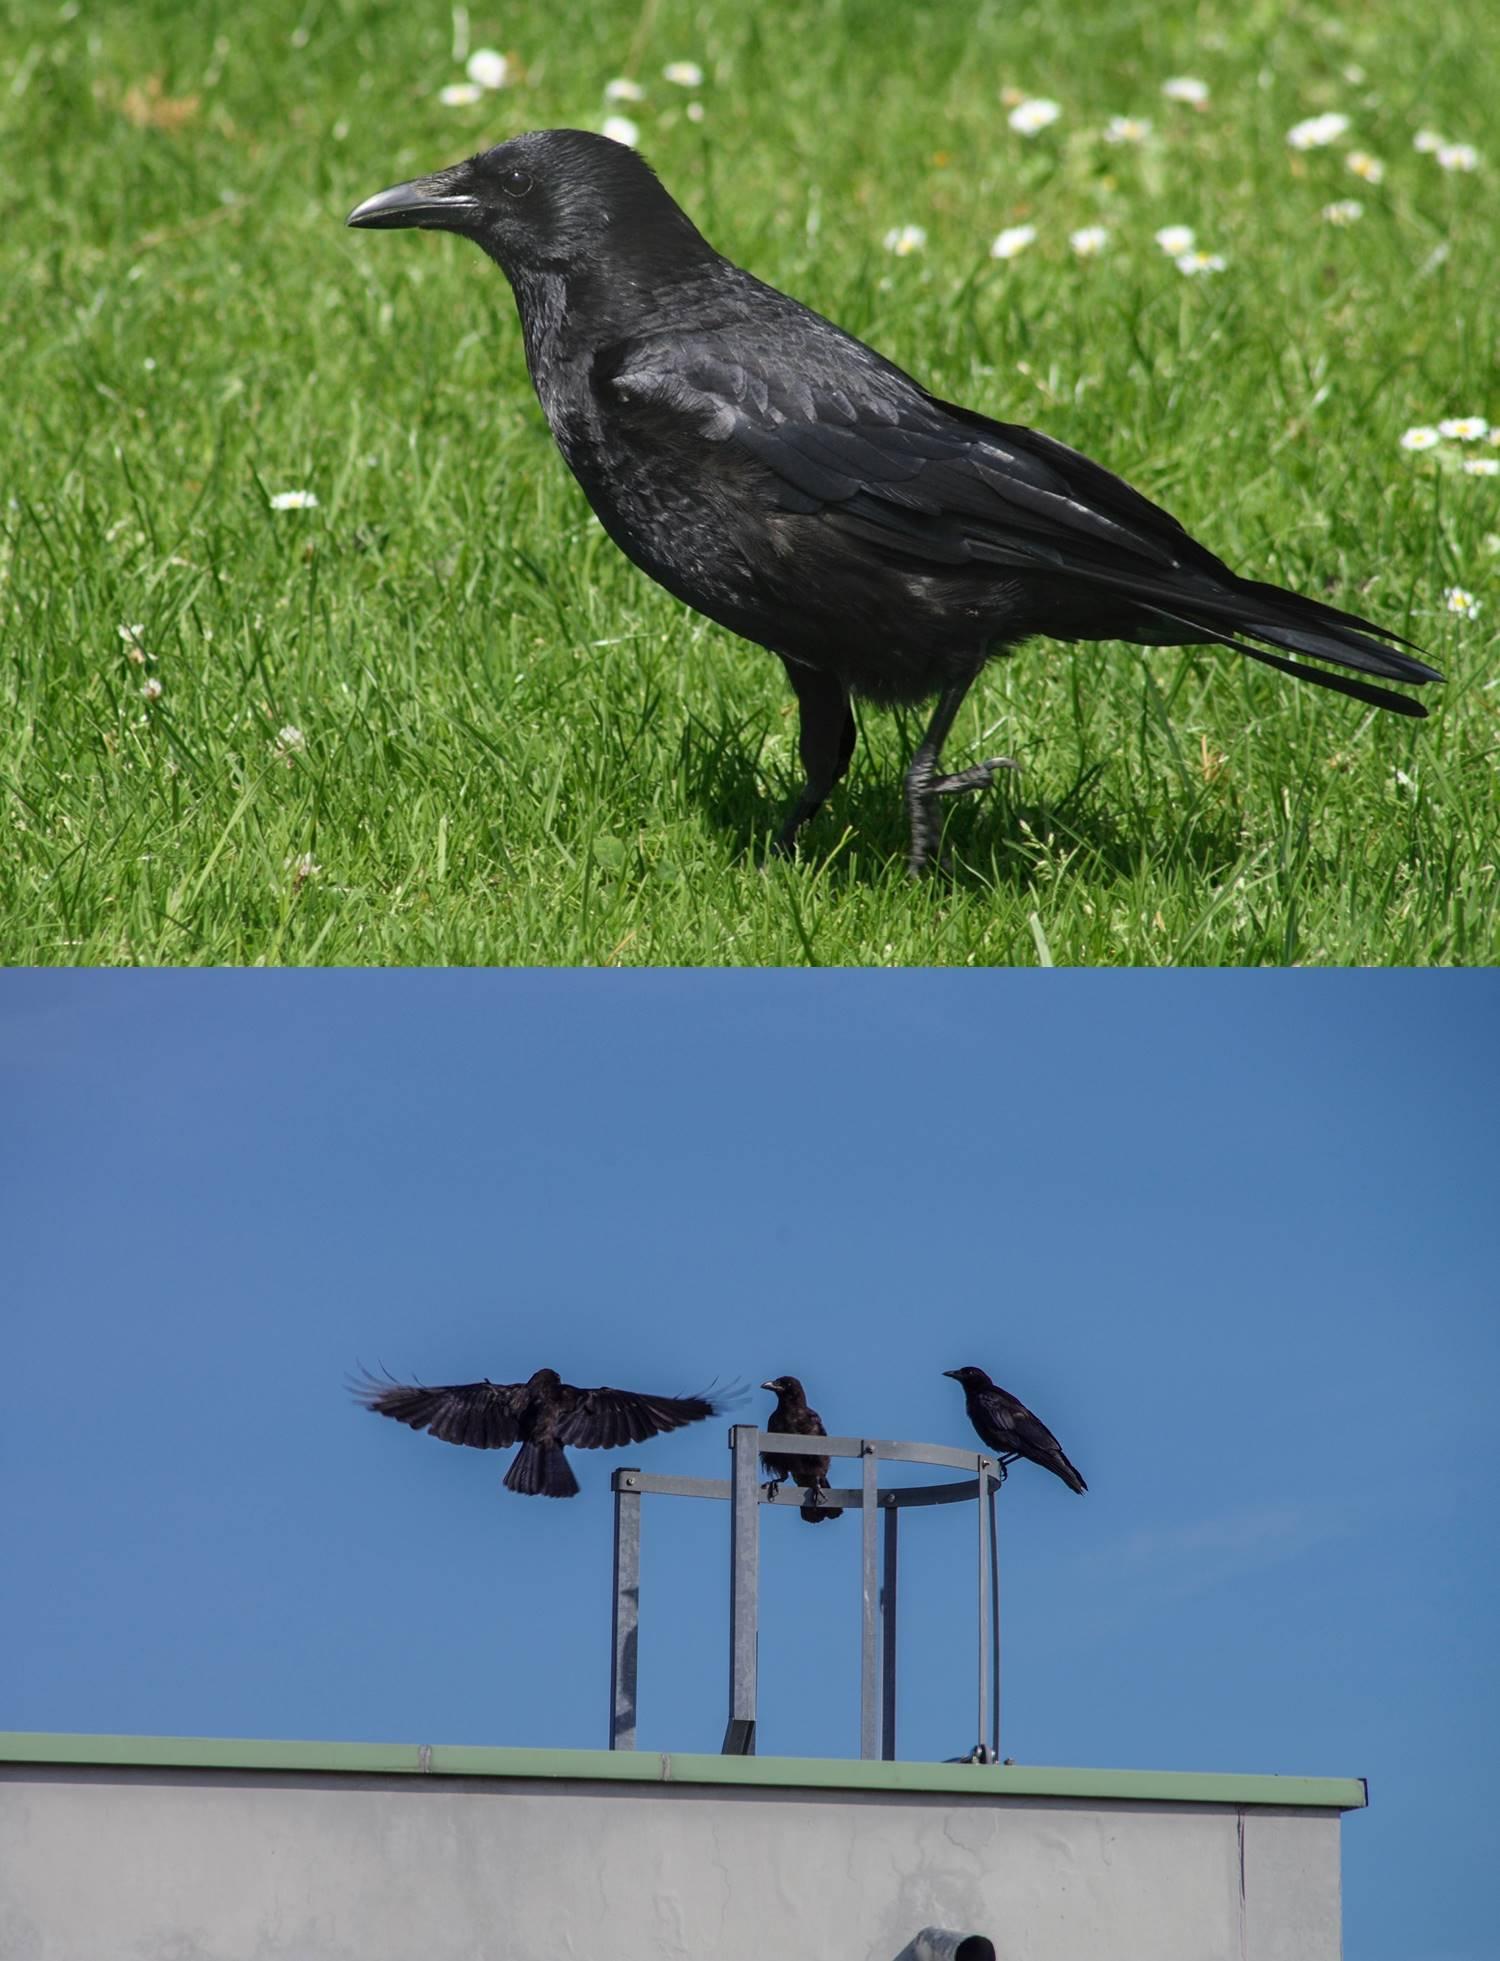 Assasins Creed Crows Concept Art